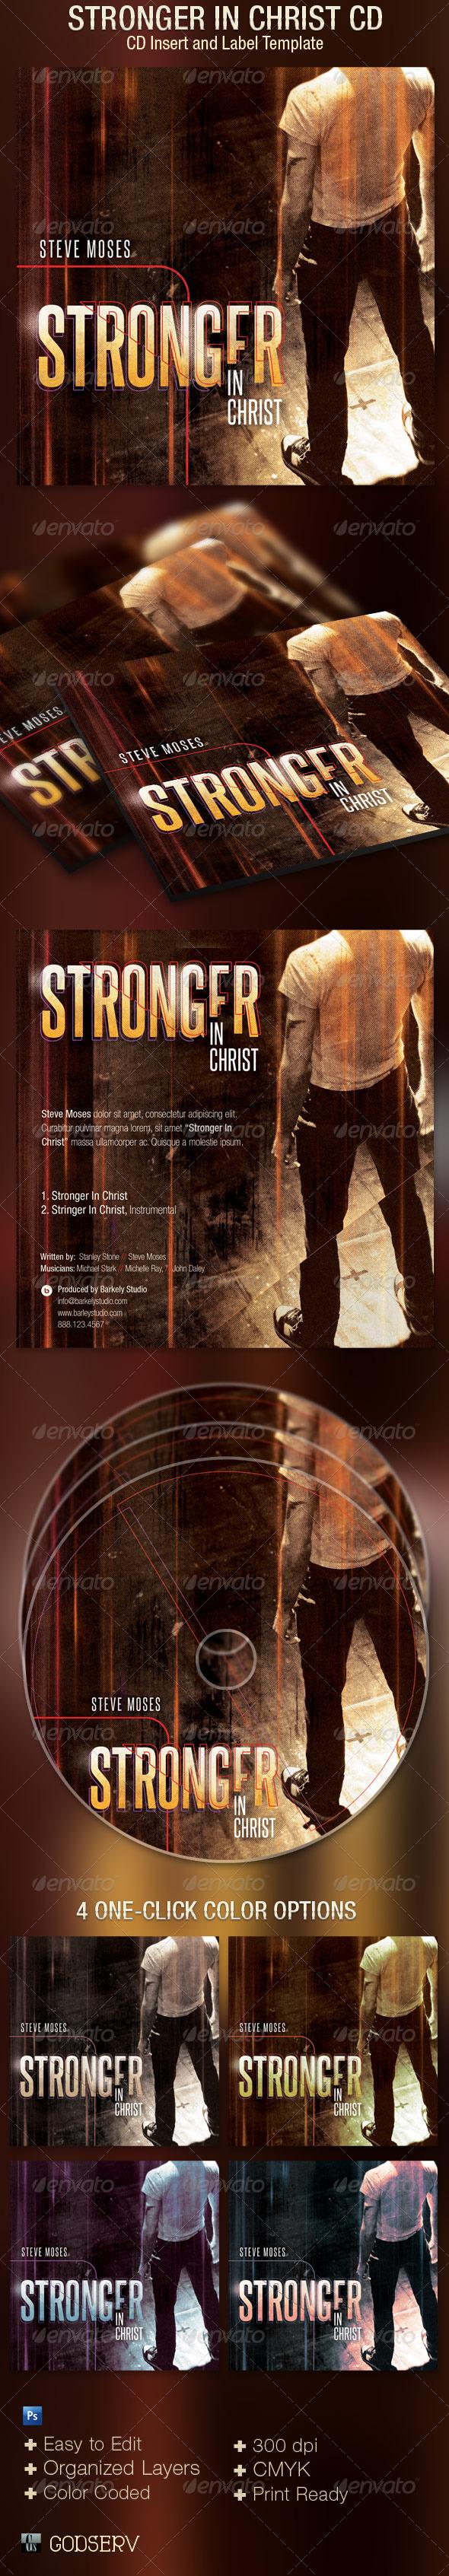 Stronger CD Artwork Template - CD & DVD Artwork Print Templates